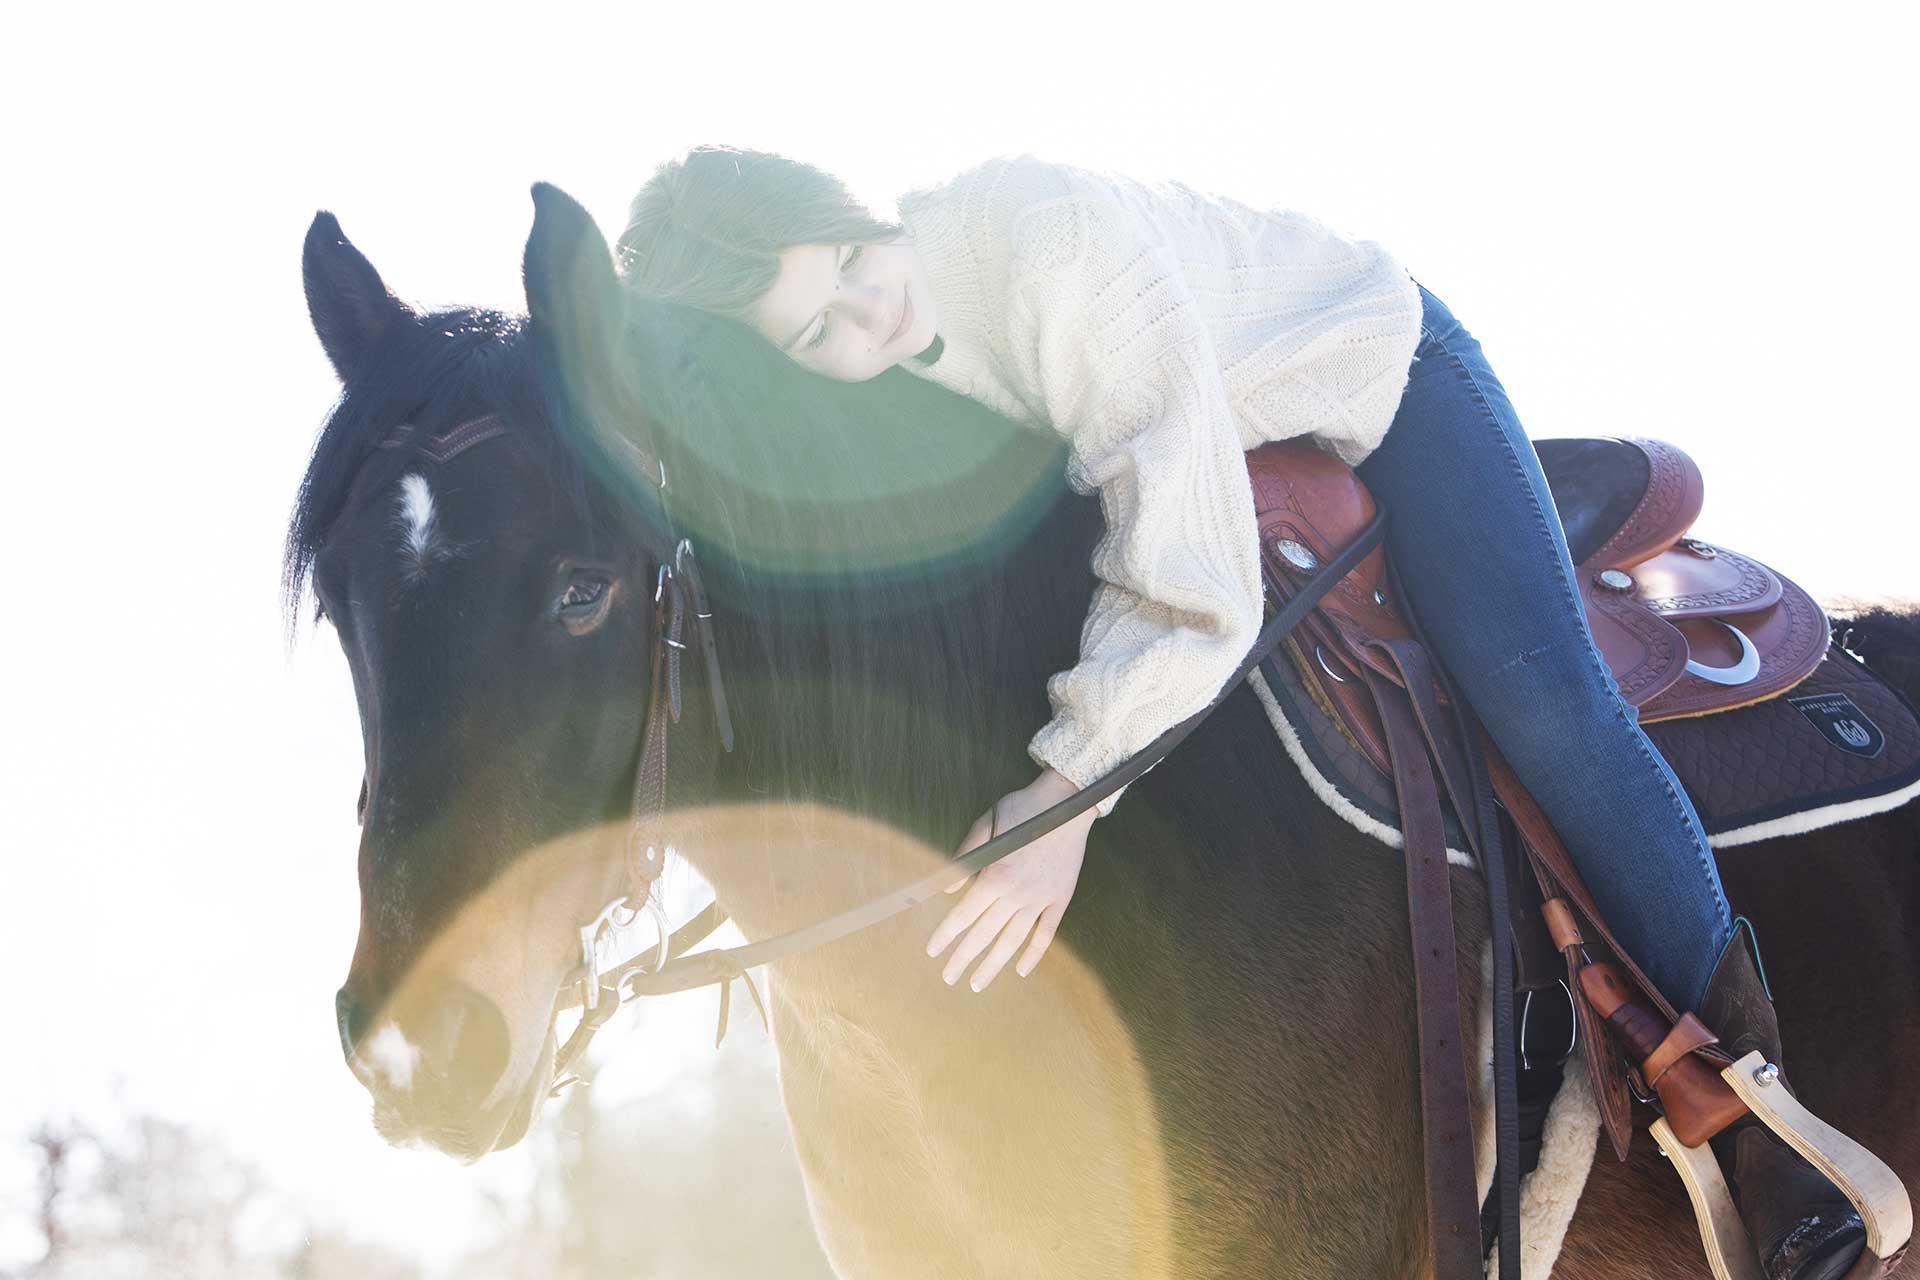 angela pfeiffer Fotografin, angela pfeiffer, pferdeshooting, pferdefotografie, pferdeshooting hamburg, pferdefoto, professionelle Pferdefotos, professionelles pferdeshooting, individuelle pferdefotos, pferdeportraits, fotos turnierpferde, turnierfotos, sportpferde fotos, fotografie, sportpferdefotografie, portrait mit Pferd, Shooting mit Pferd, individuelle Pferdefotografie